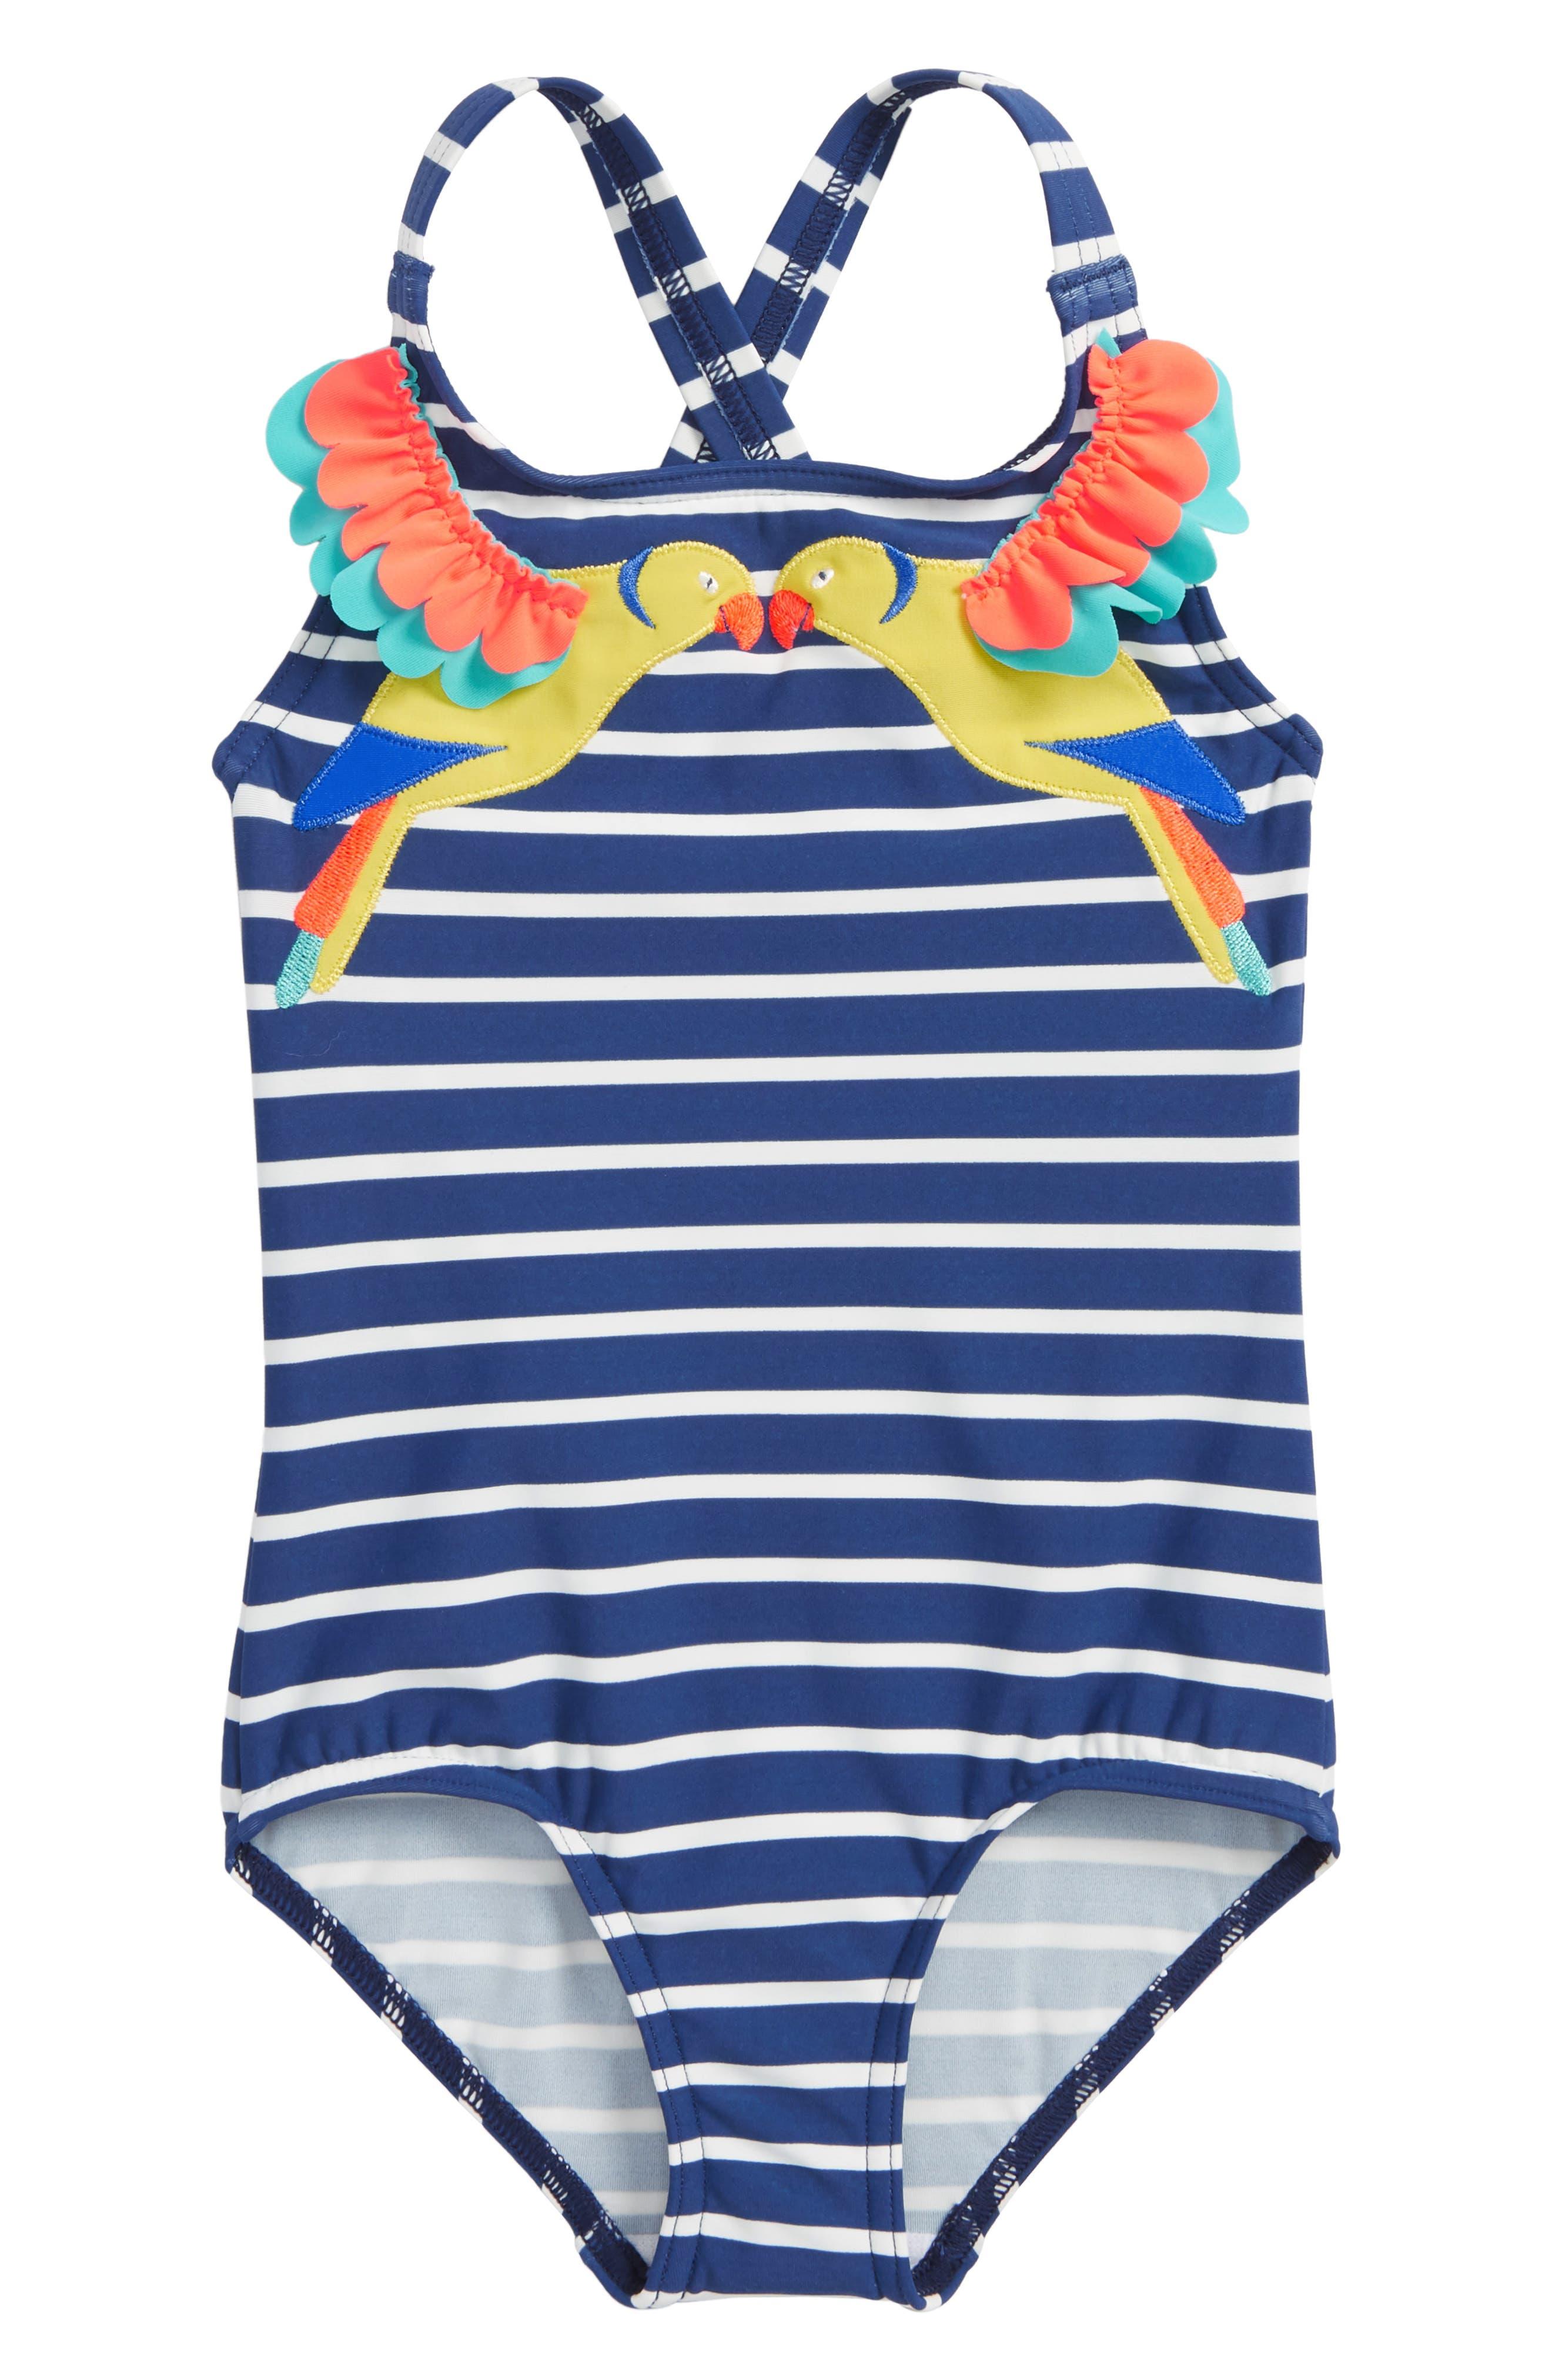 Tropical Birds One-Piece Swimsuit,                             Main thumbnail 1, color,                             404